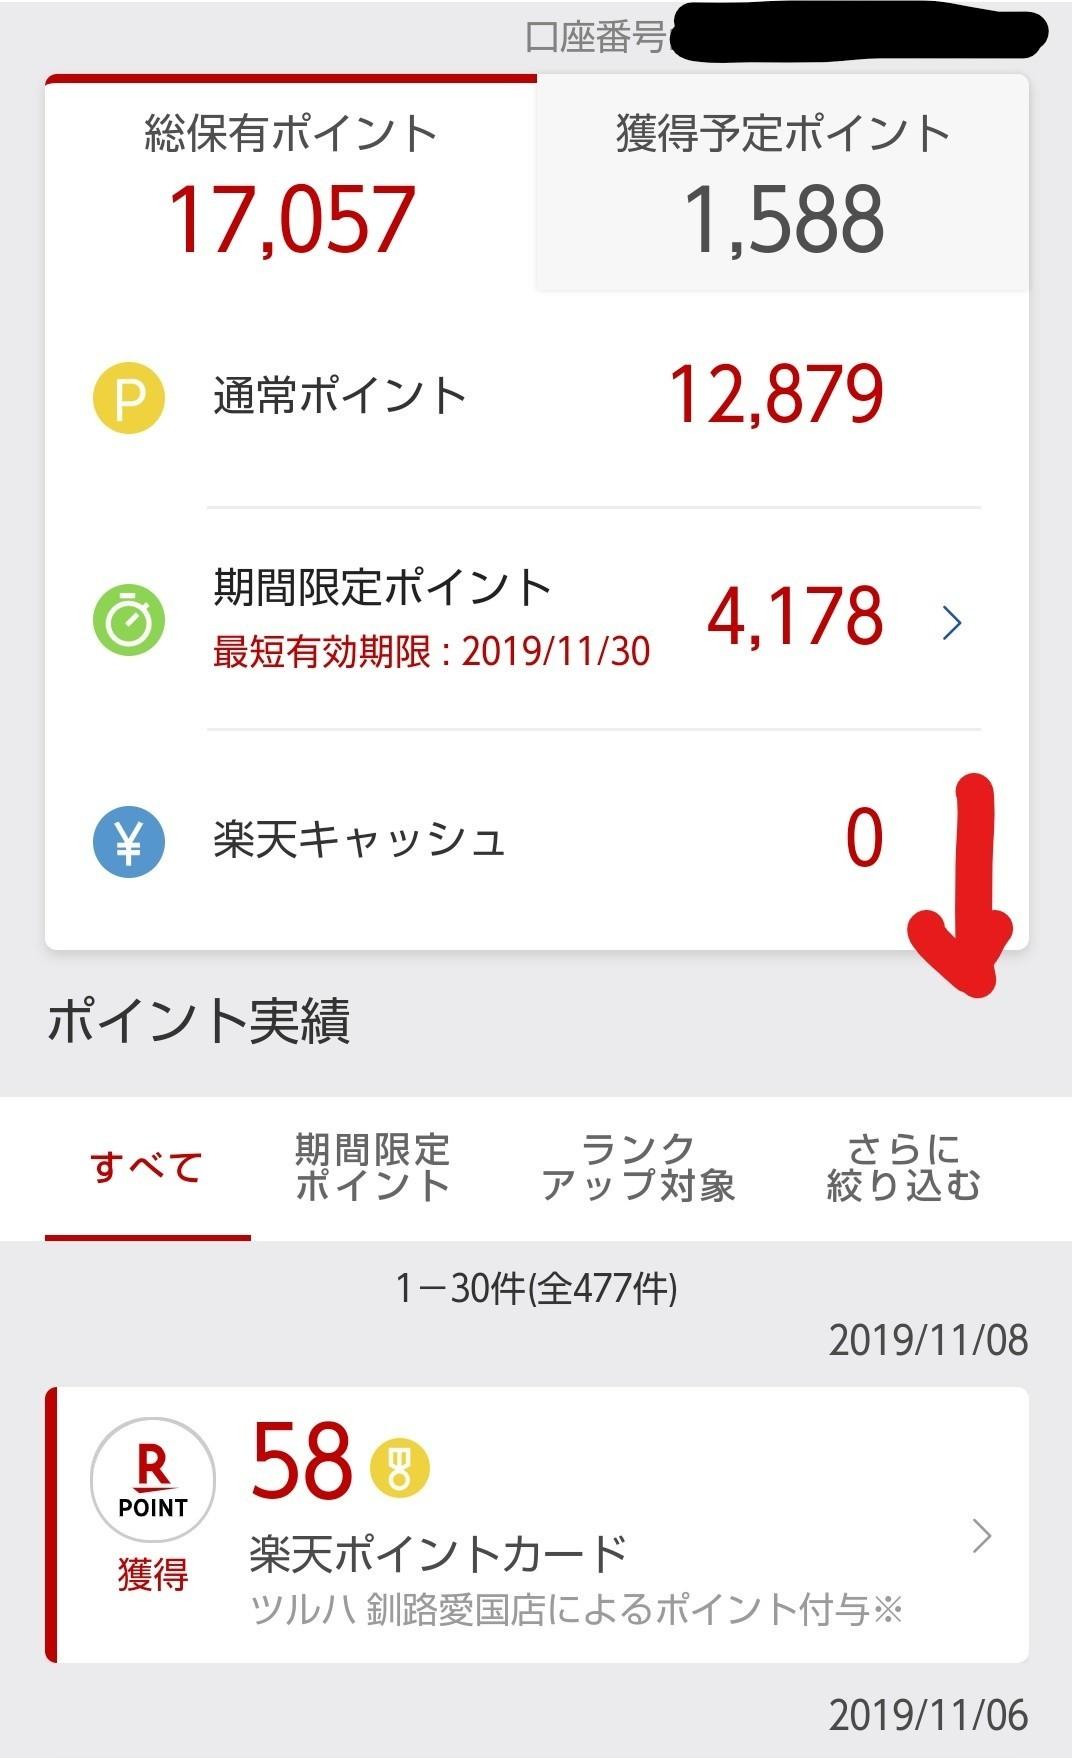 Inked楽天ポイント10月実績モバイルログイン②_LI